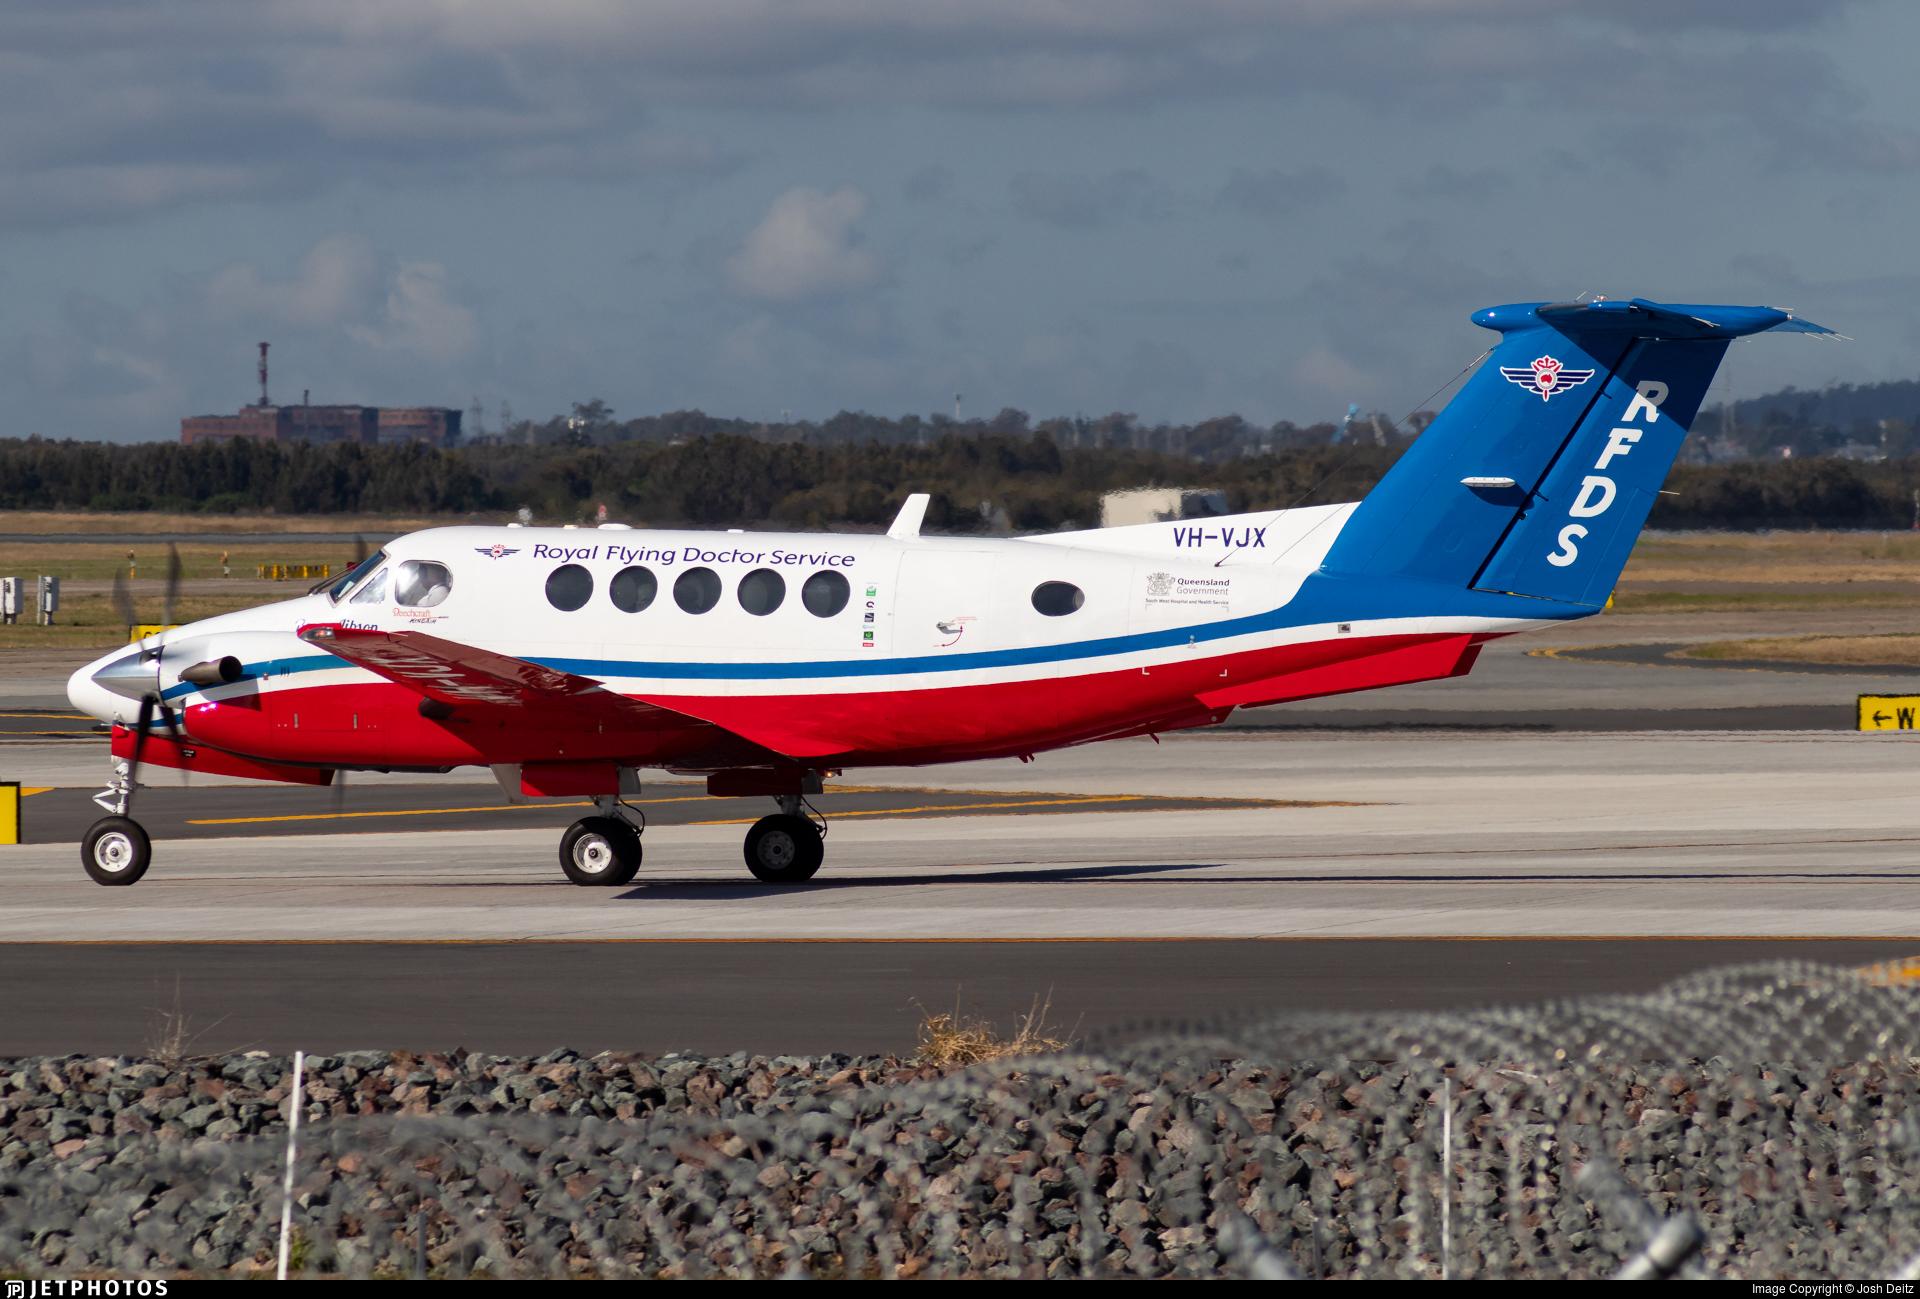 VH-VJX - Beechcraft 200 Super King Air - Royal Flying Doctor Service of Australia (Queensland Section)